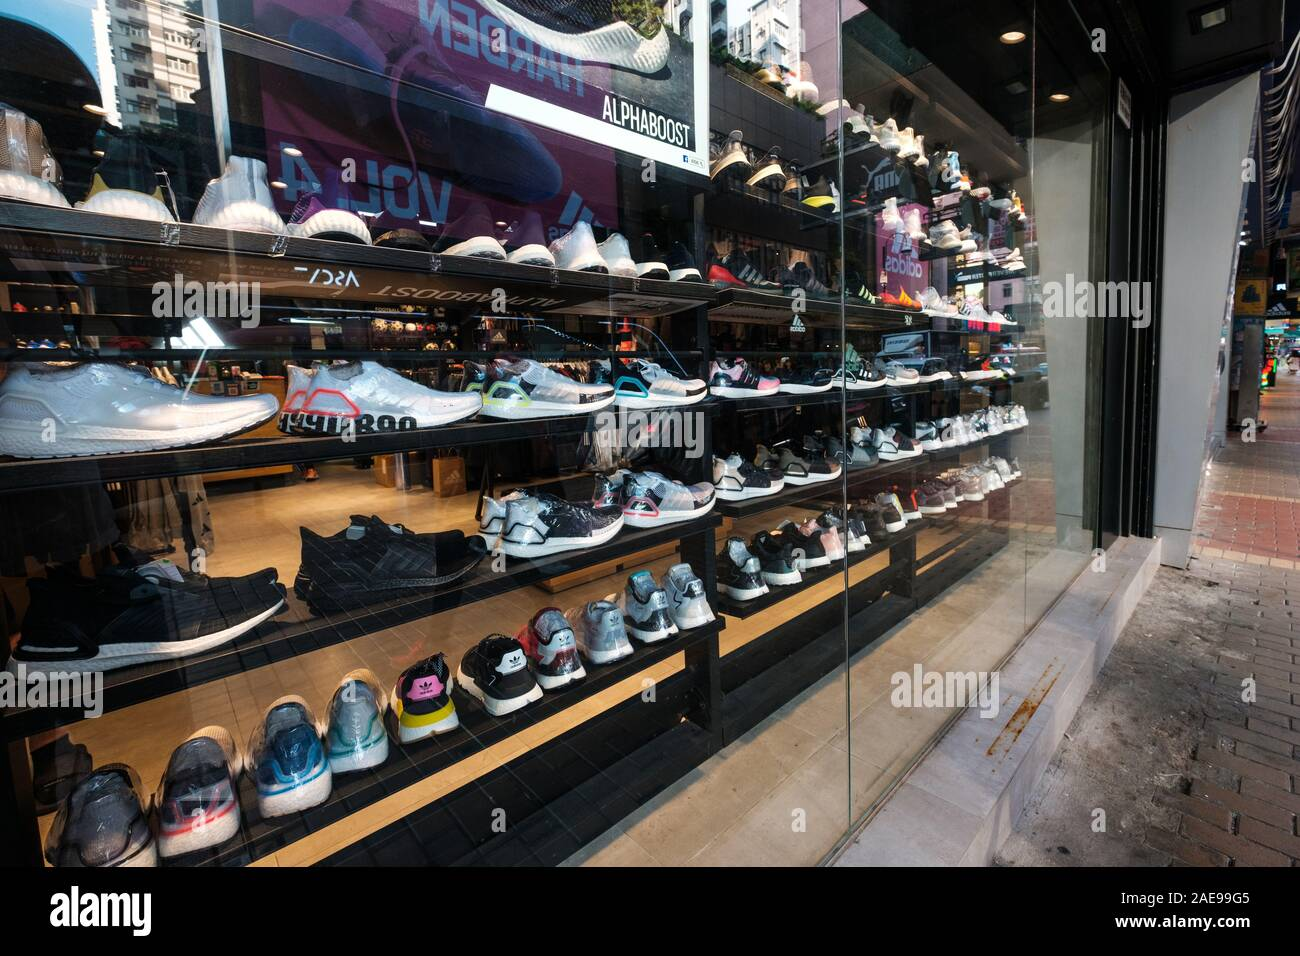 Trainers Shop Window Display Adidas